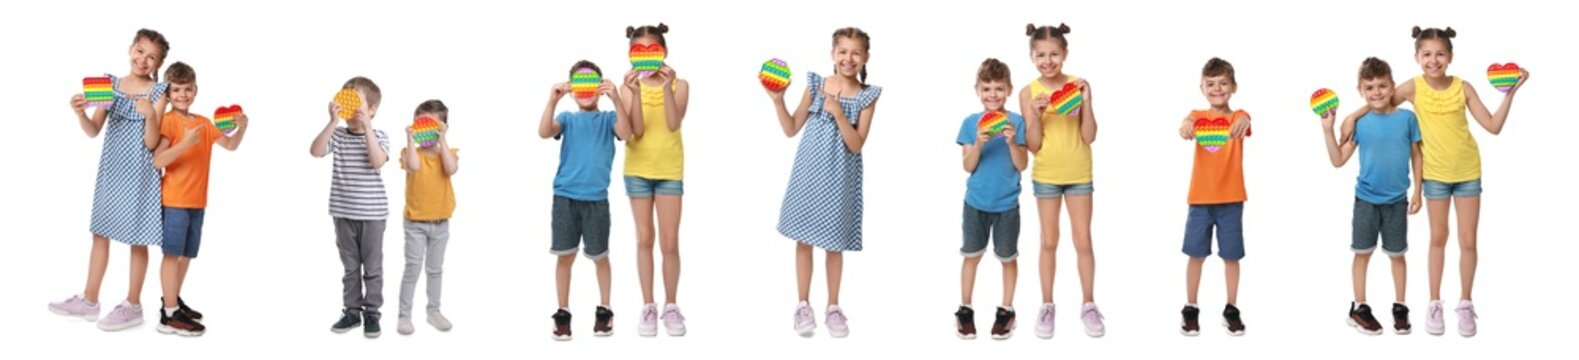 Cute children with pop it fidget toys on white background, collage. Banner design